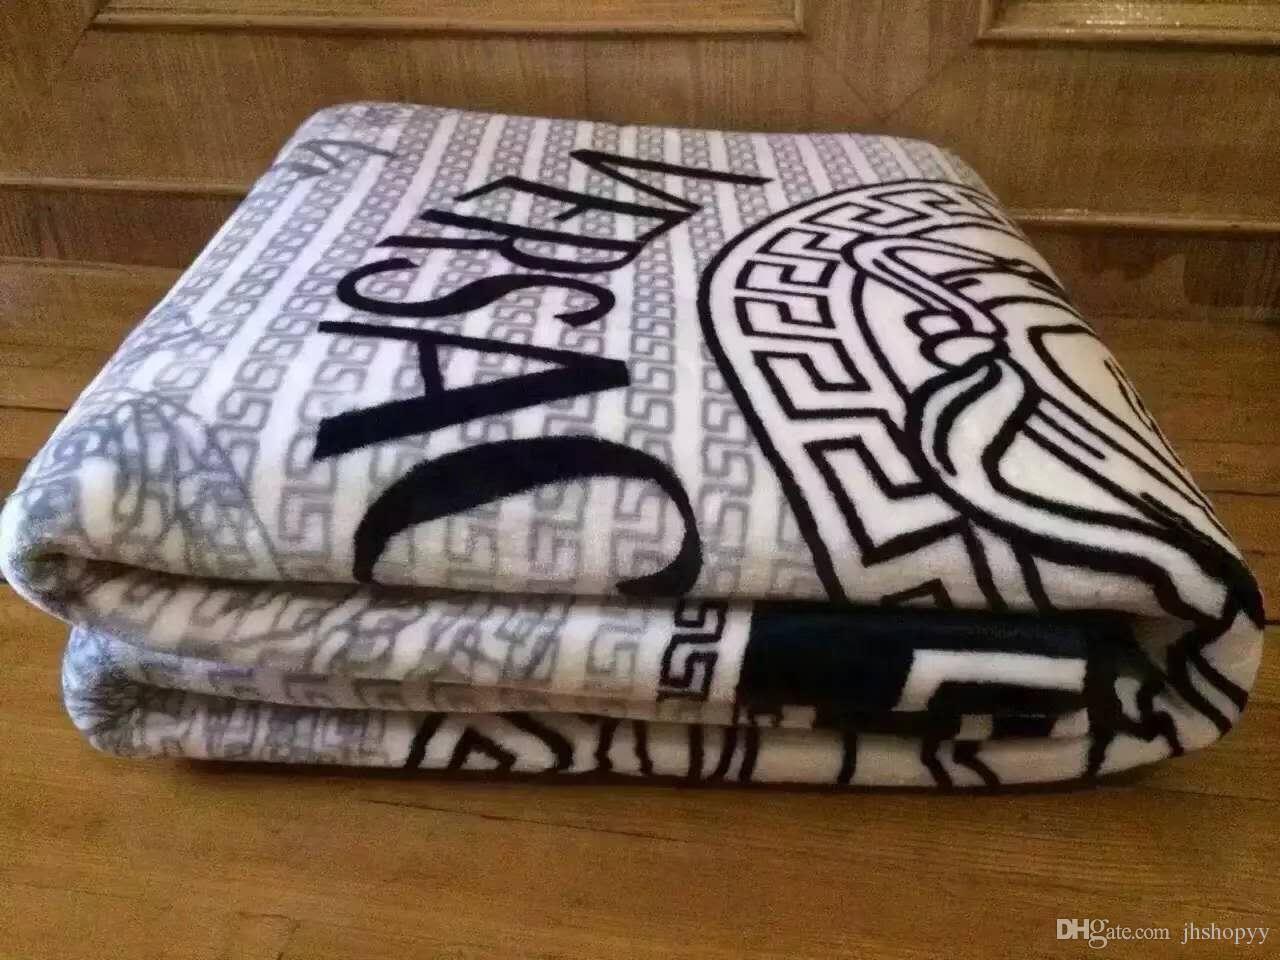 Hot brand van medusa blankets flannel luxury warm soft blankets jpg  1280x960 Flannel blankets 1364edb1e